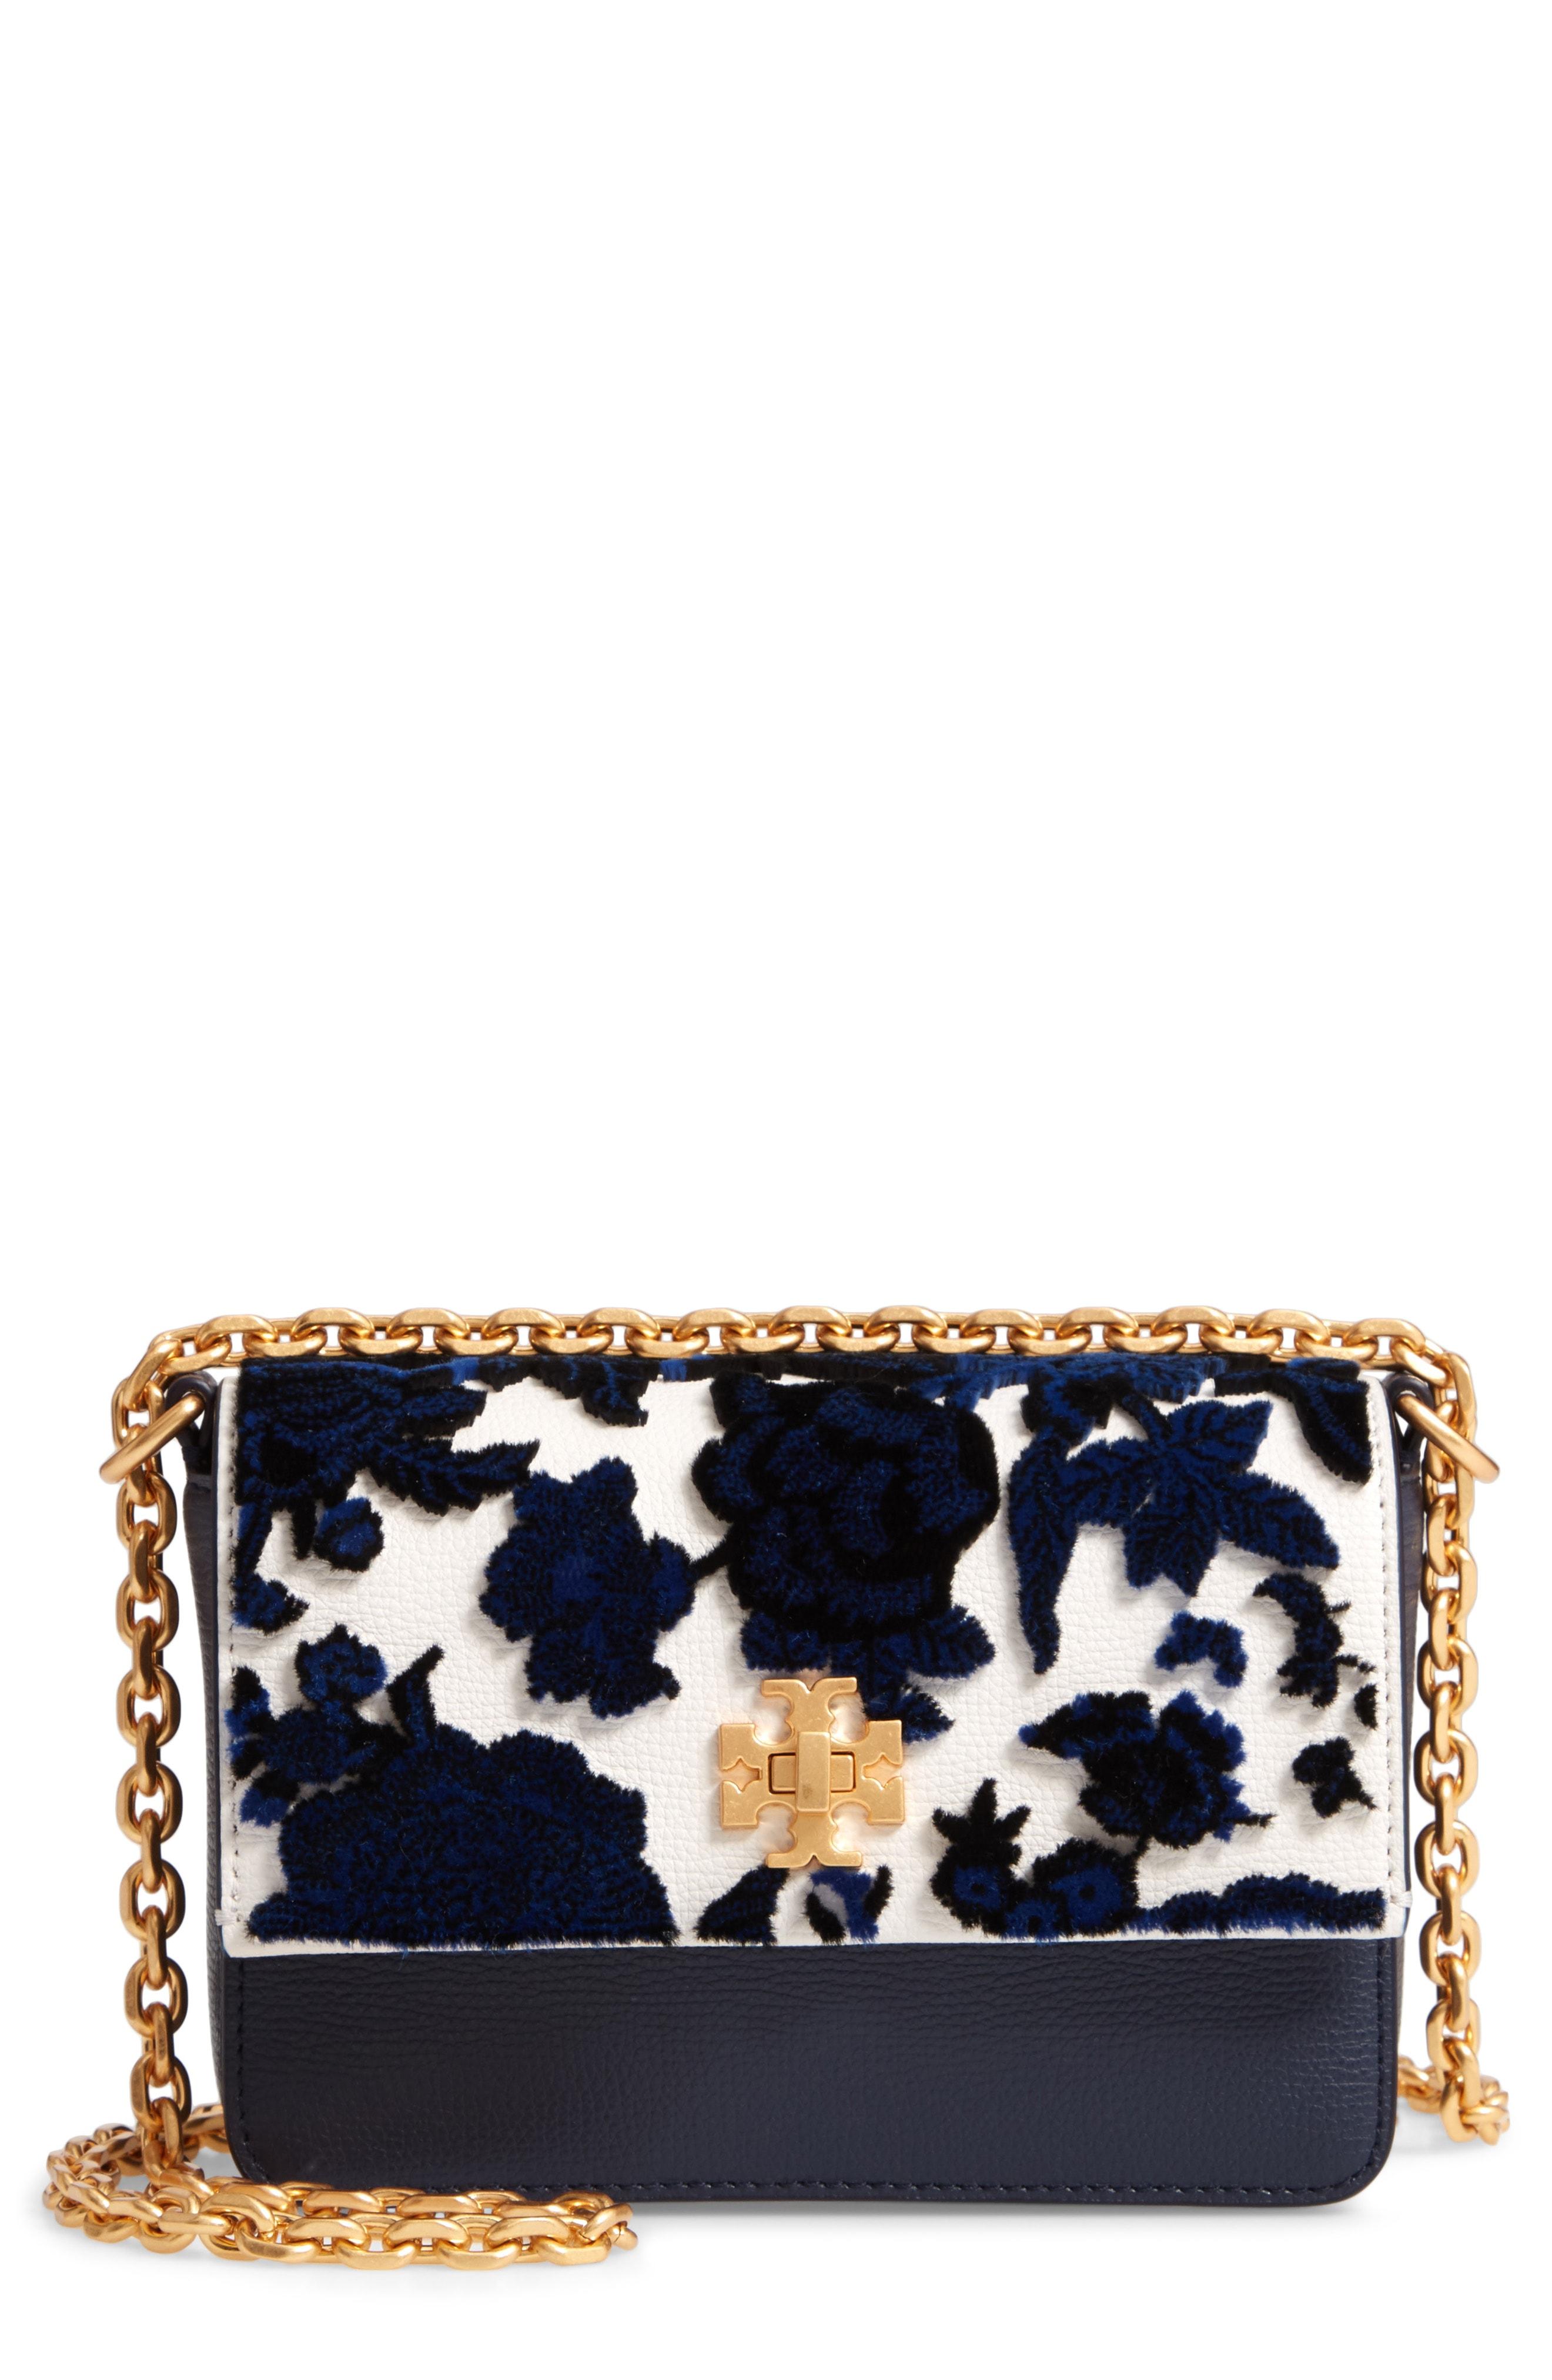 Tory Burch Mini Kira Leather & Fil Coup Bag